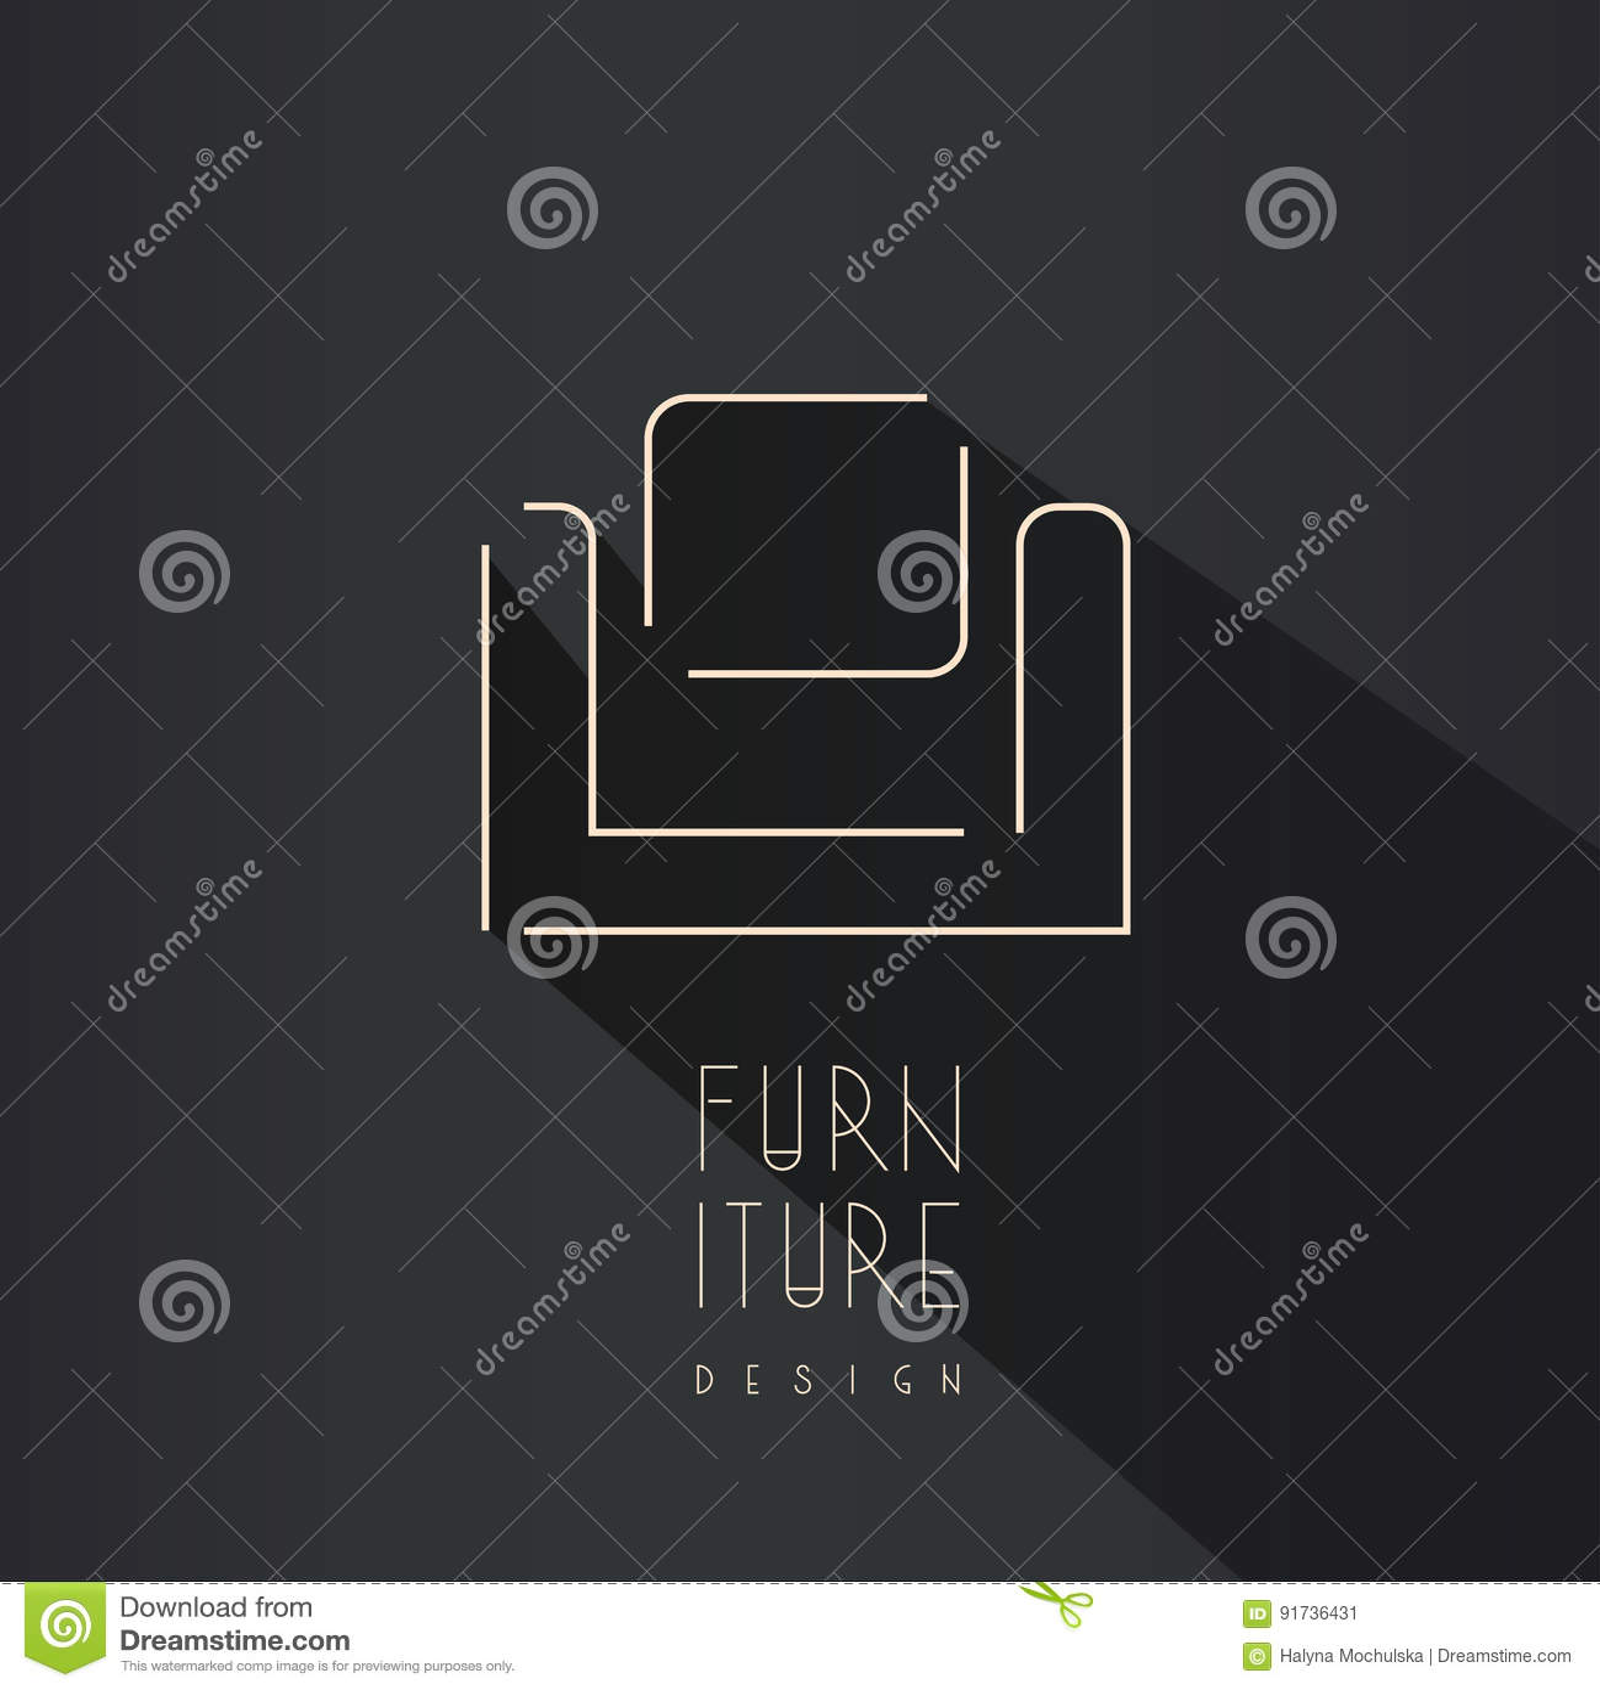 Abstract Chair Symbol - Creative Furniture Logo Design. Stock Vector ...